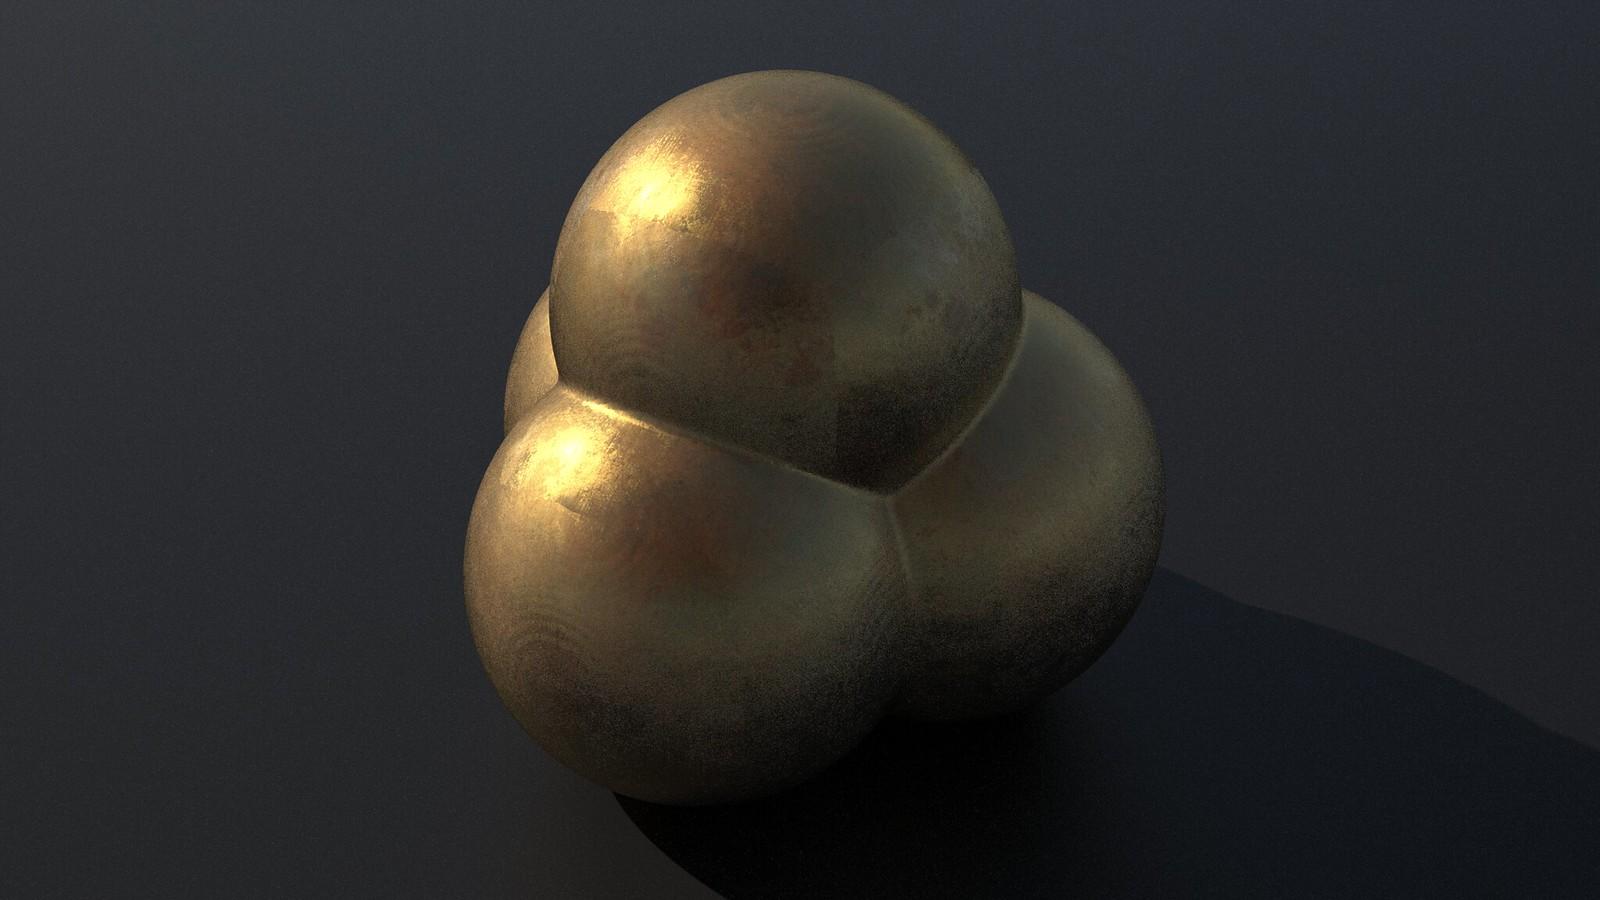 Sólidos Platónicos - Tetrahedro